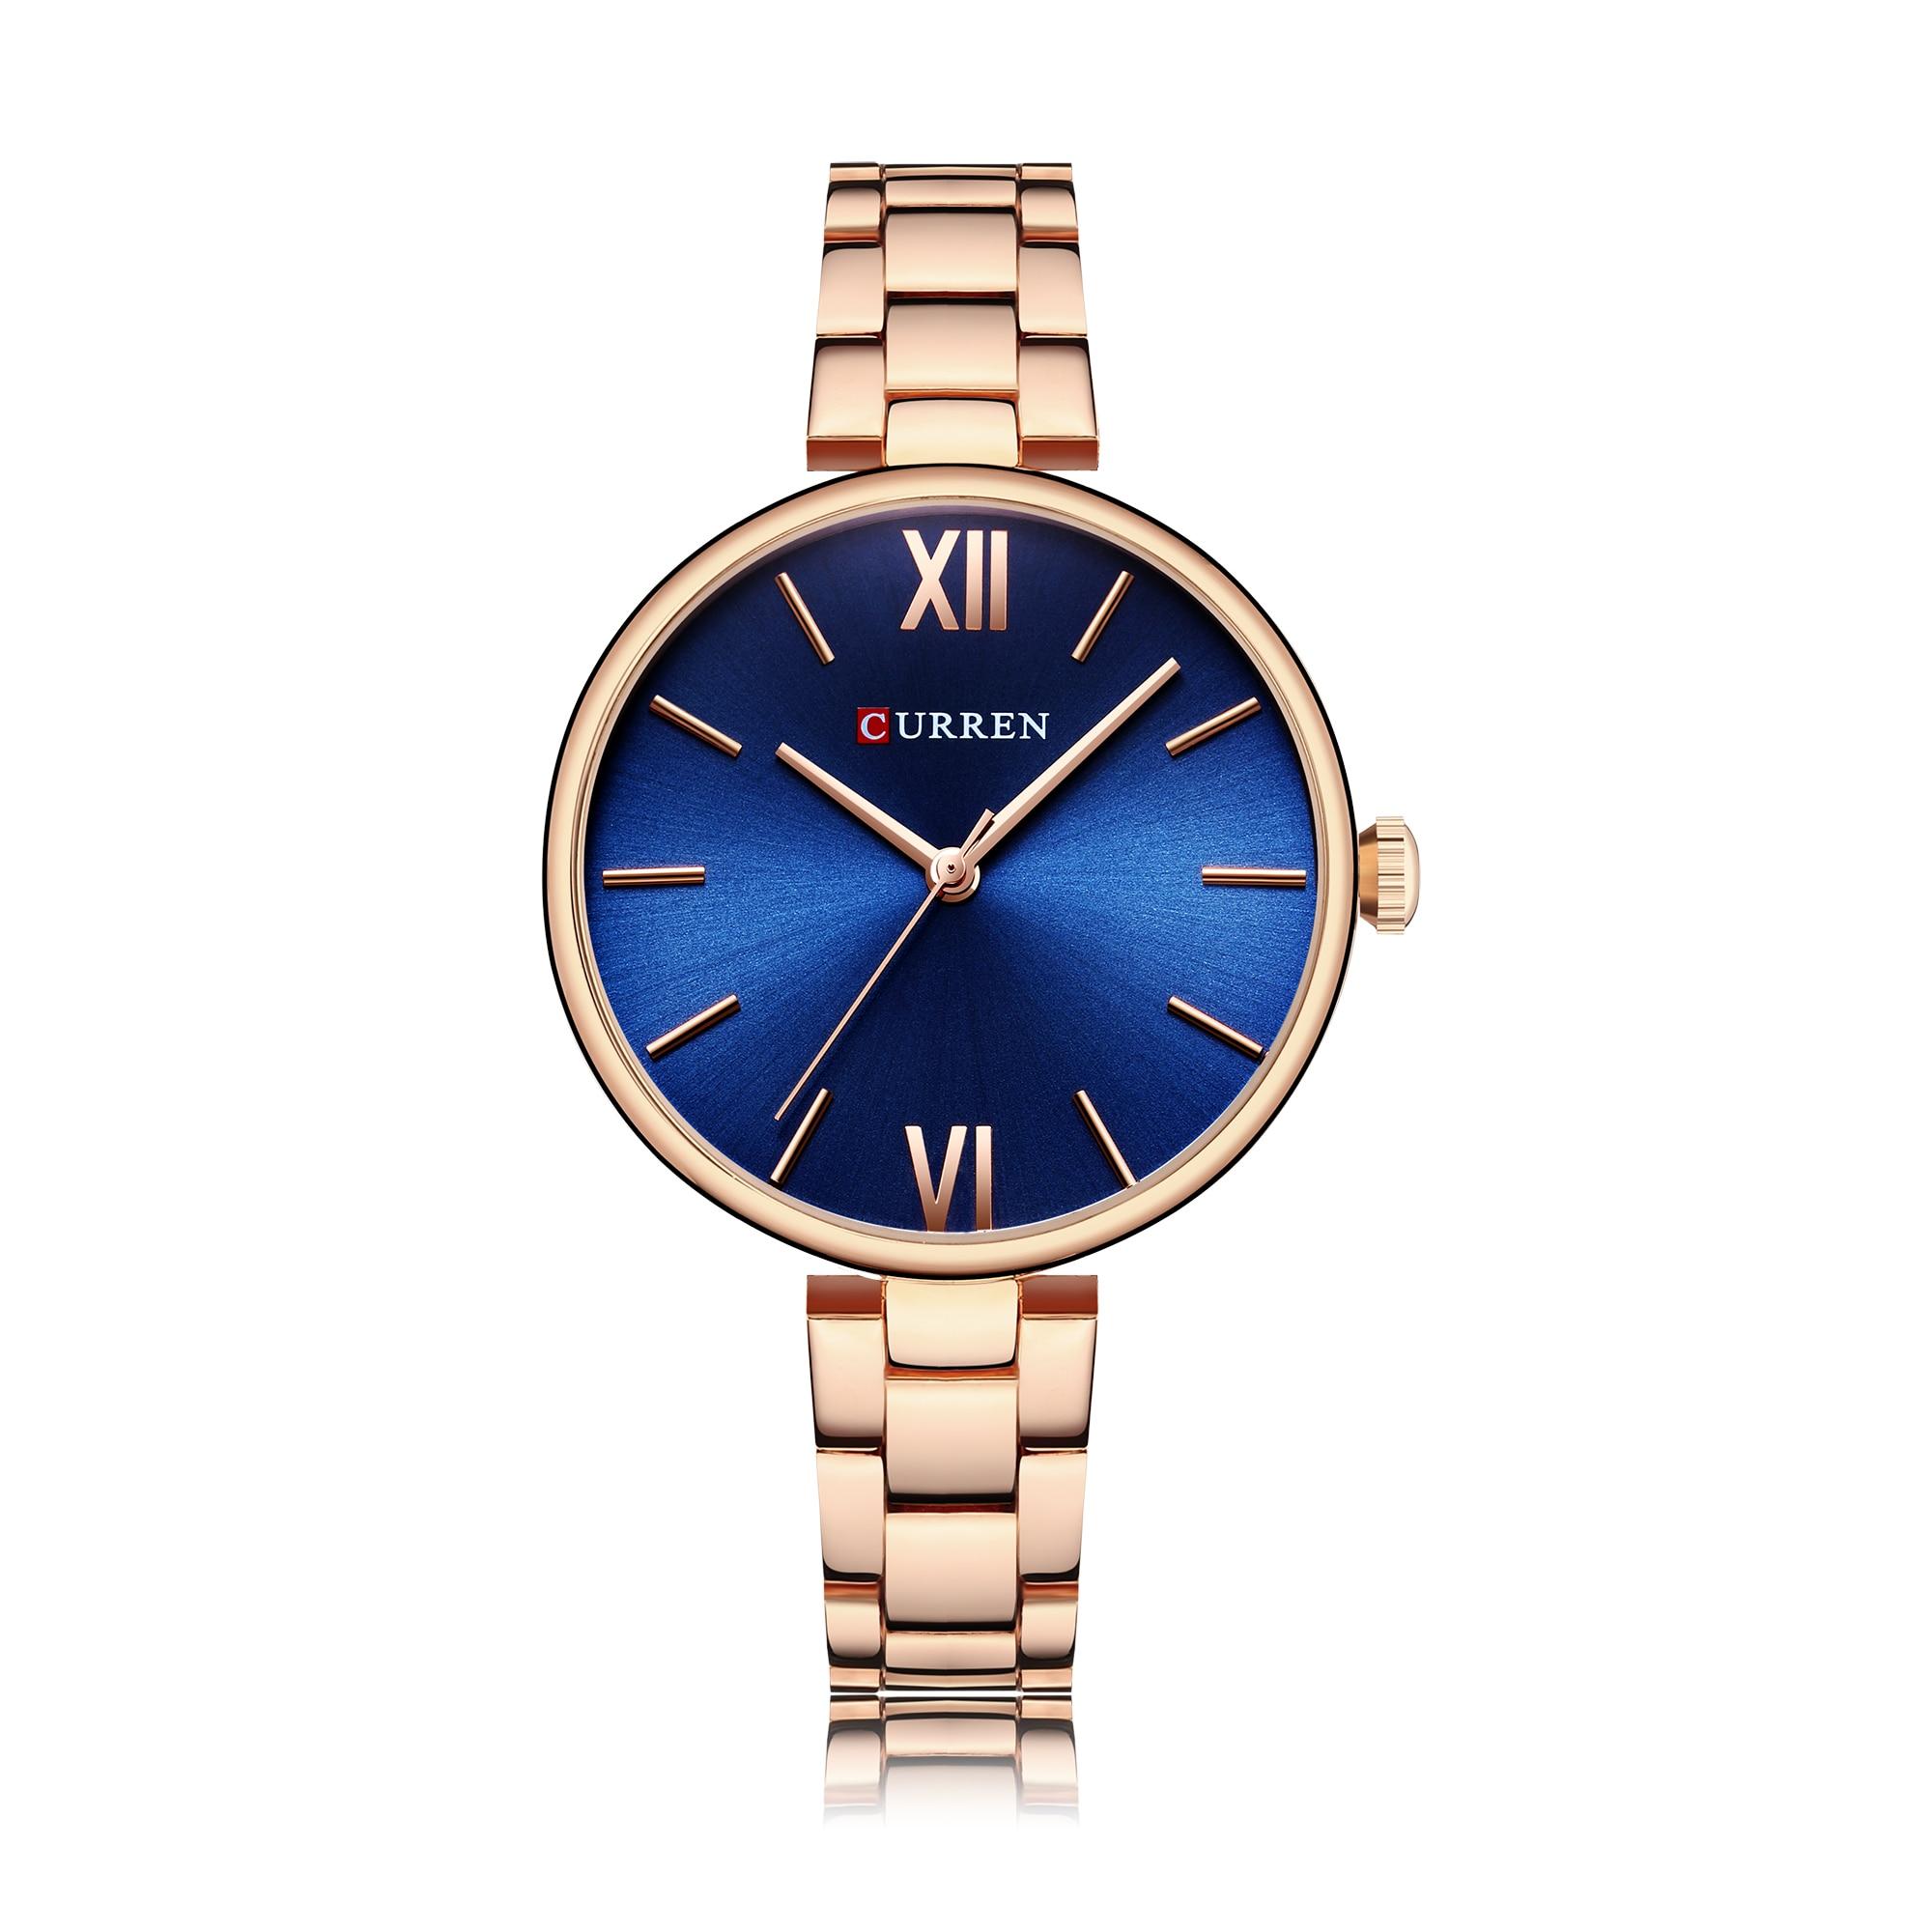 CURREN Women Watch Top Brand Luxury Casual Ladies Wristwatch Noble Stainless Steel Blue Dial Waterproof Hardlex Relogio Feminino enlarge